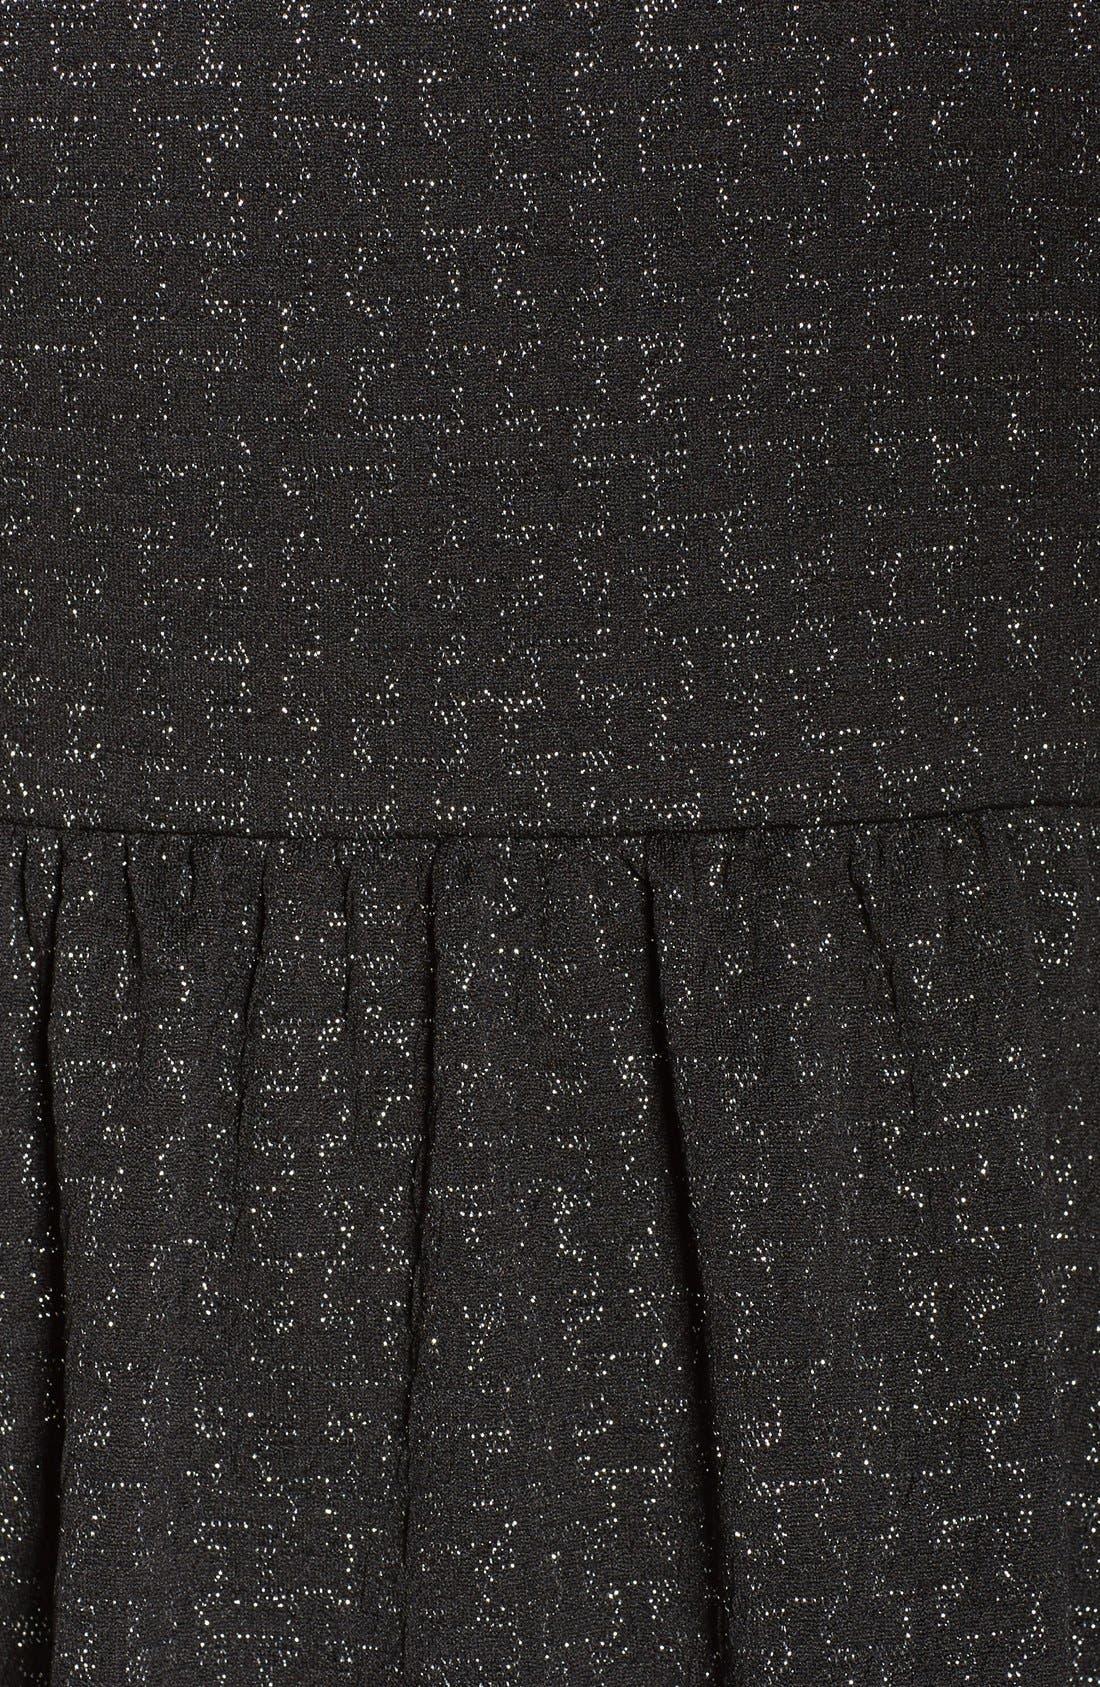 Embellished Stretch Fit & Flare Dress,                             Alternate thumbnail 6, color,                             004